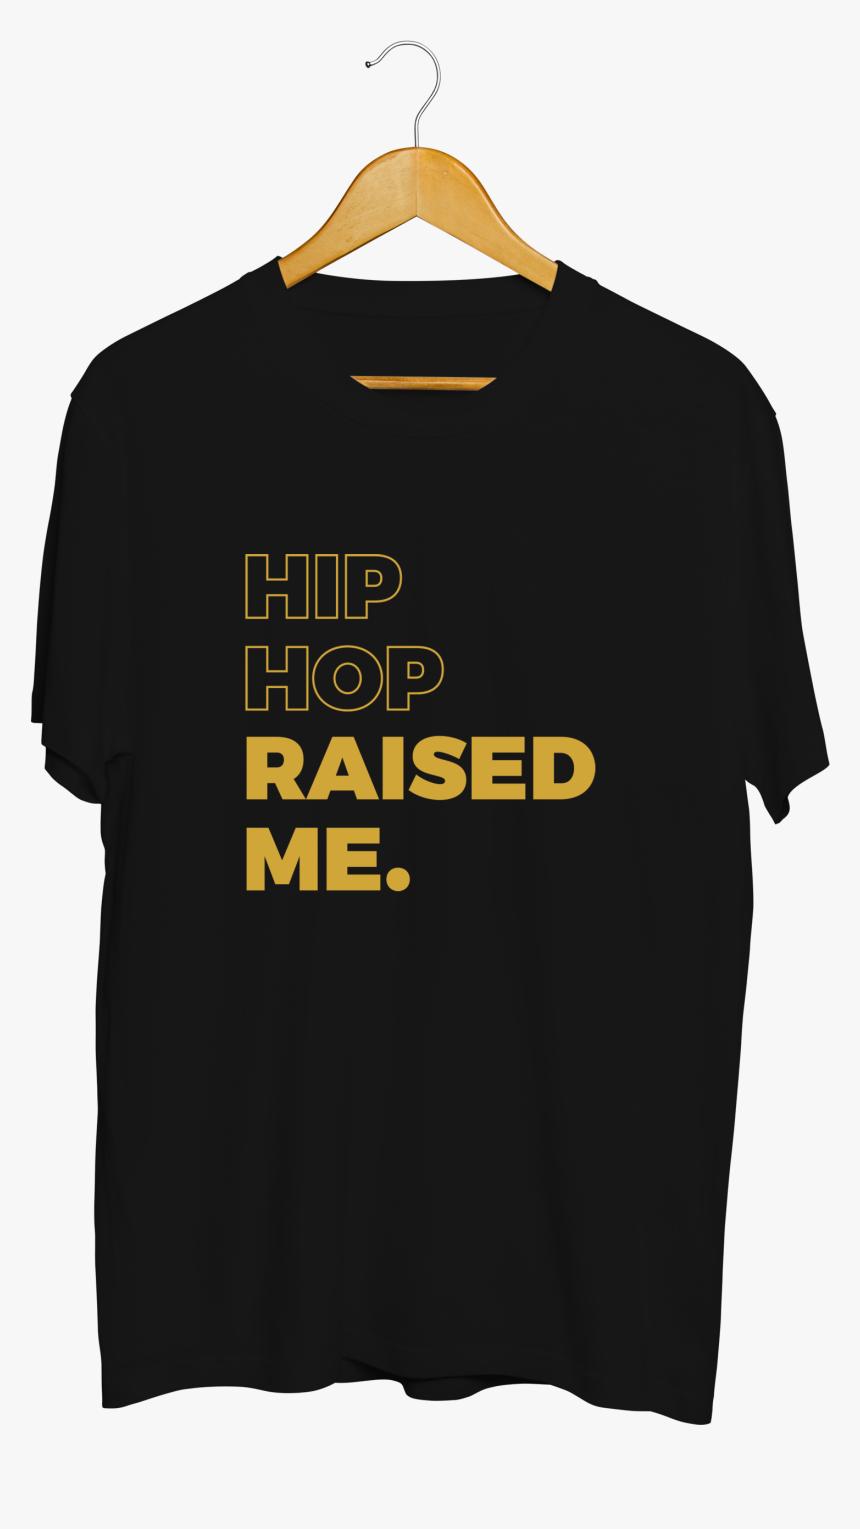 Hiphop Black Shirt La T Shirt Design- - Active Shirt, HD Png Download, Free Download